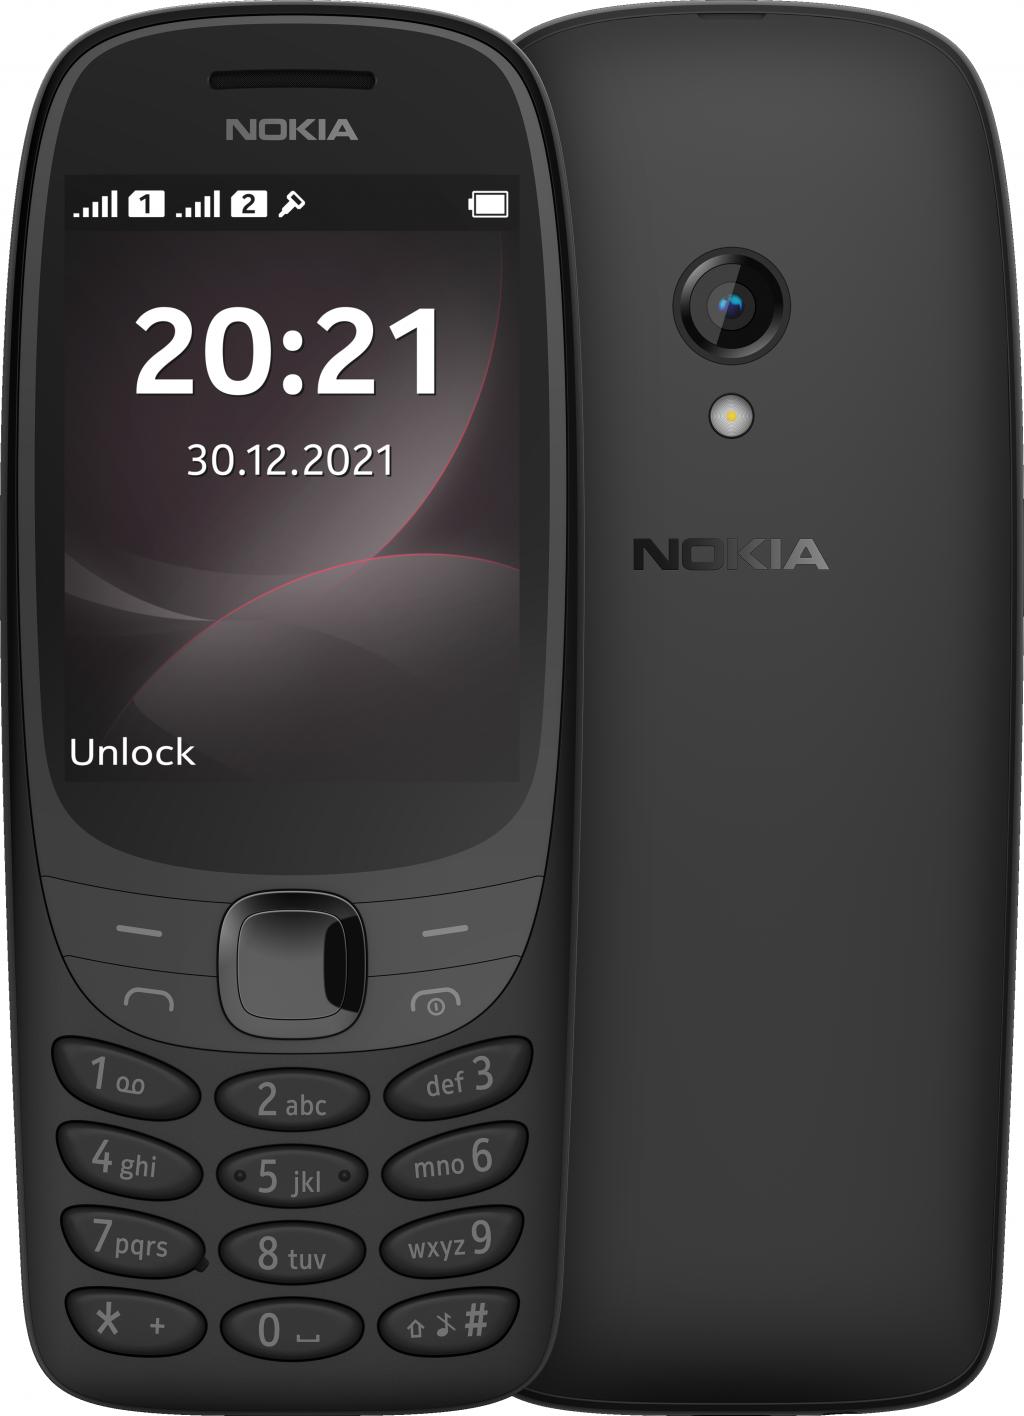 "Nokia 6310 TA-1400 Black, 2.8 "", TFT, 0.016 MB, Dual SIM, Nano Sim, 3G, Bluetooth, 5.0, USB version Micro, Built-in camera, Main camera 0.2 MP, 1150 mAh"